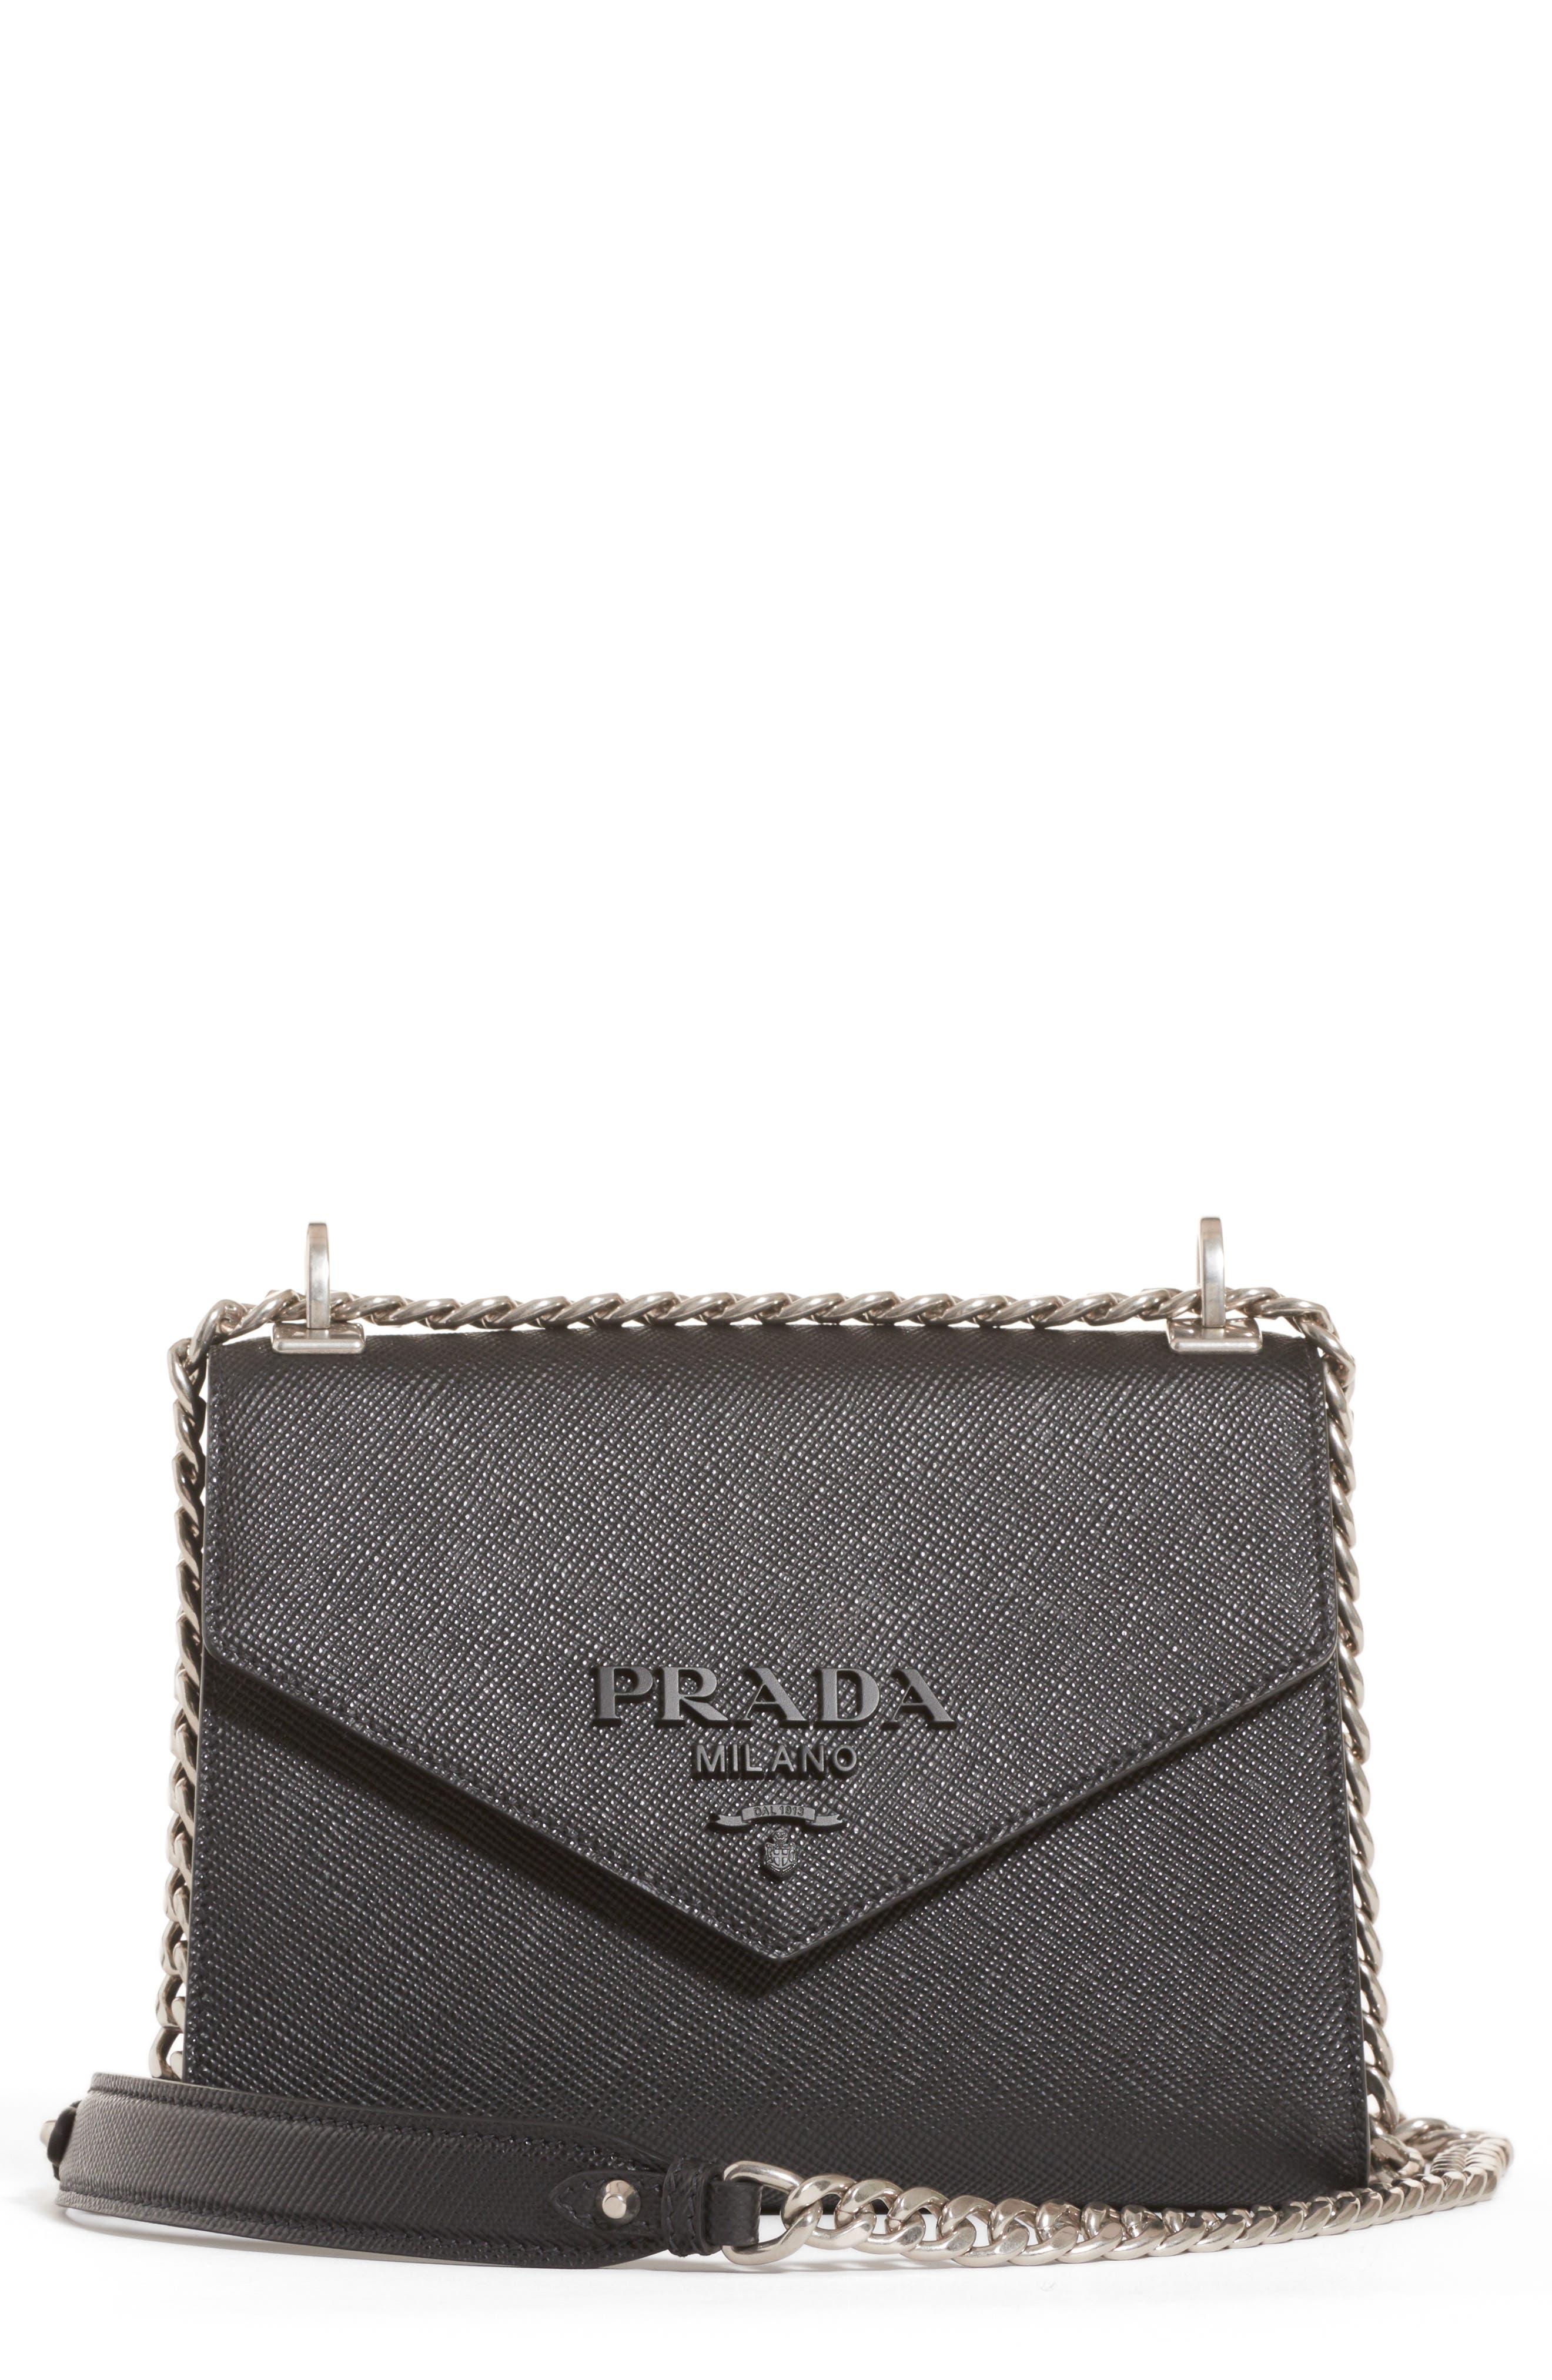 PRADA,                             Monochrome Saffiano Leather Shoulder Bag,                             Main thumbnail 1, color,                             NERO